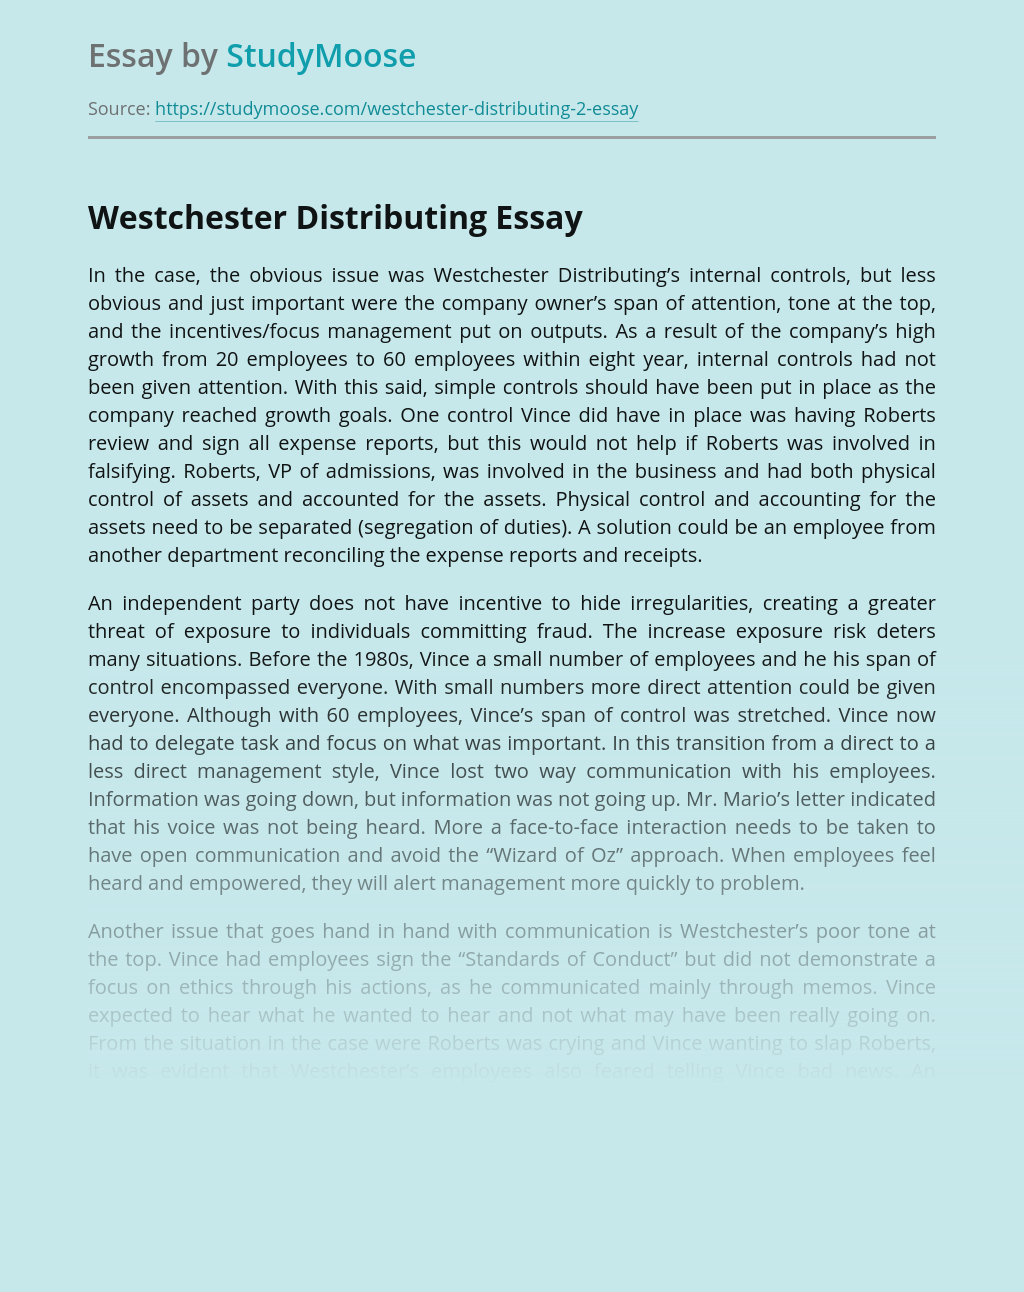 Westchester Distributing